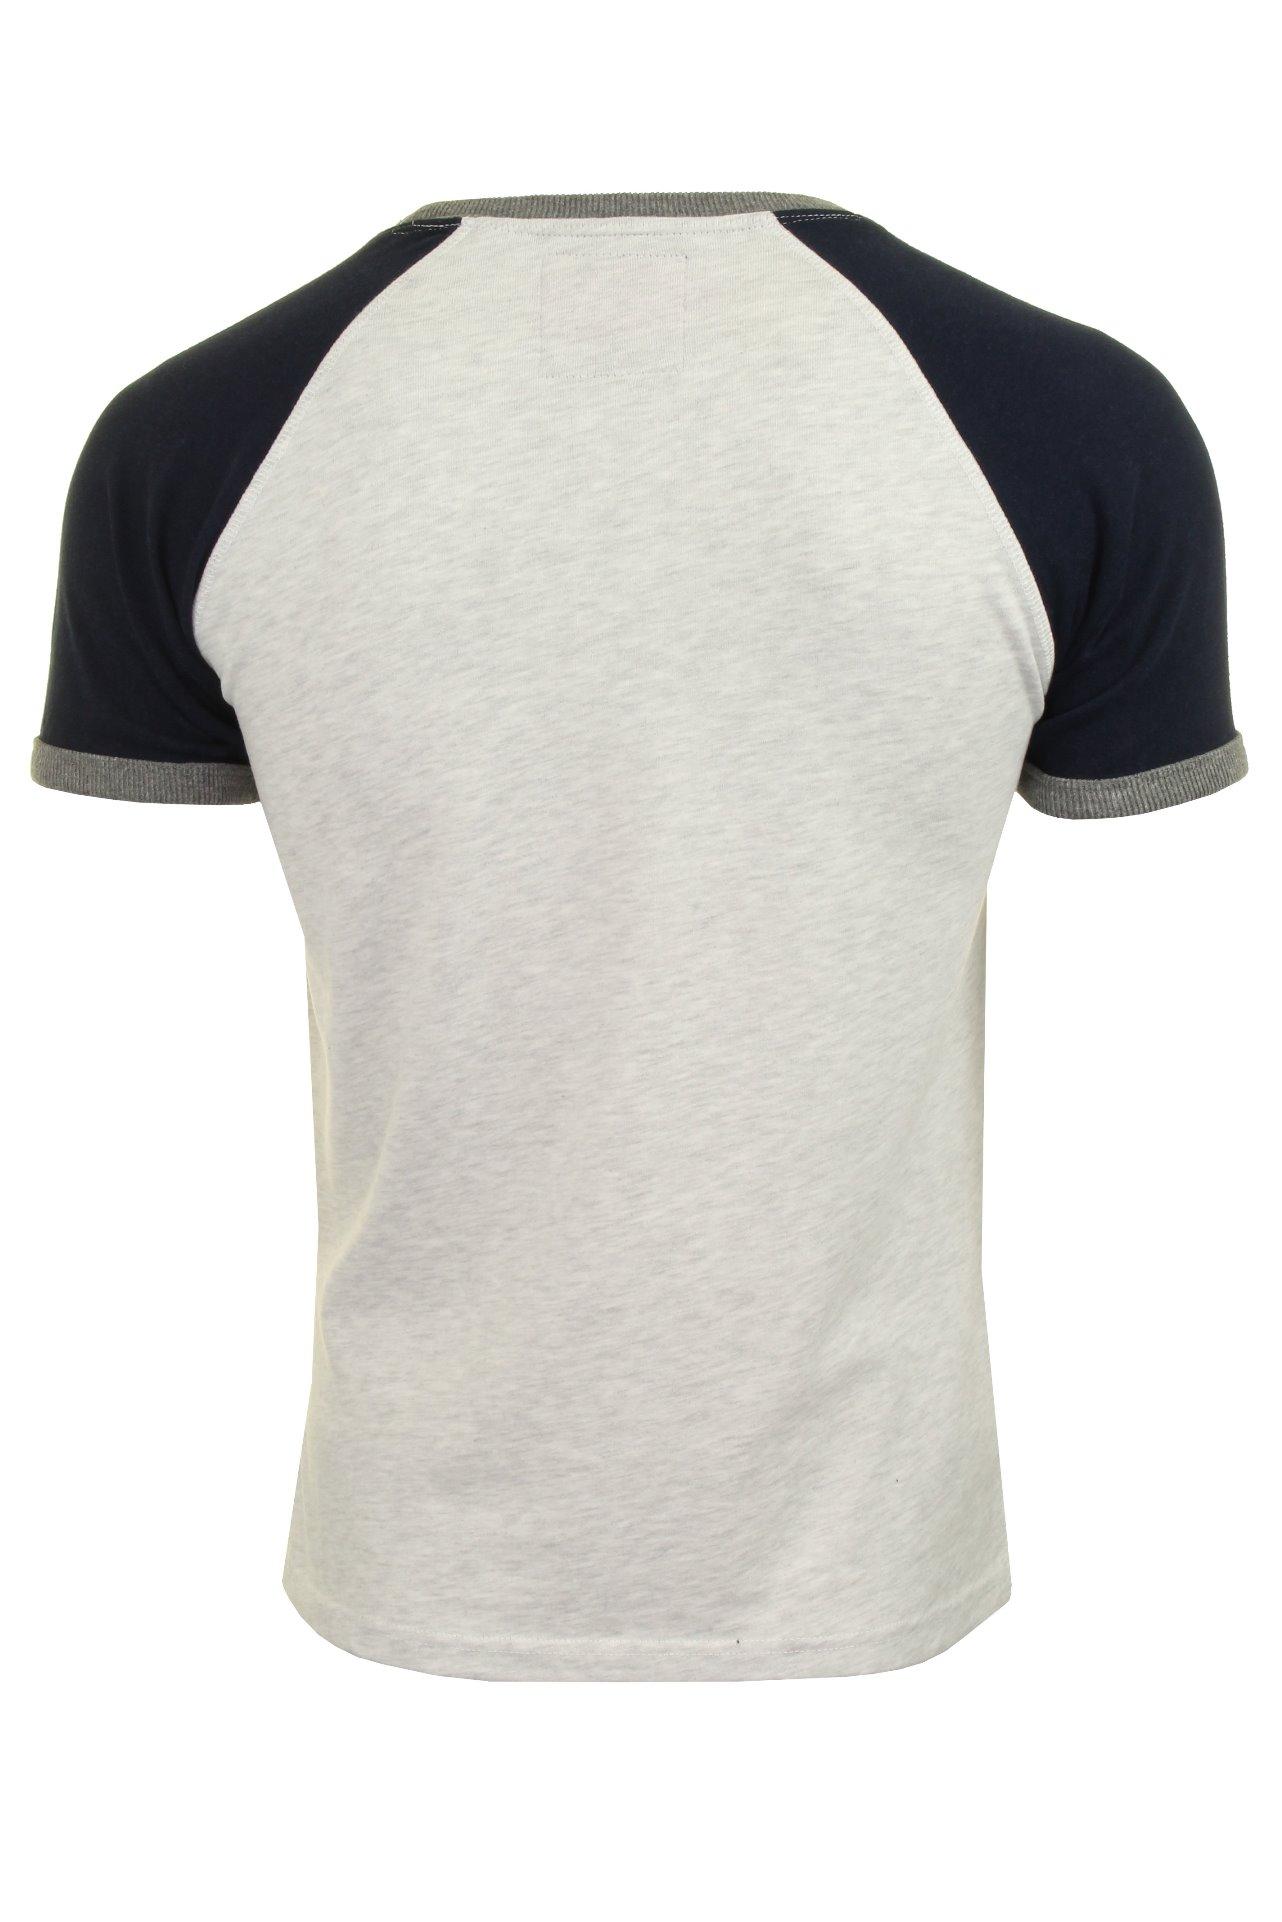 Superdry-T-shirt-homme-034-Premium-Goods-Raglan-Tee-034-a-Manches-Courtes miniature 5